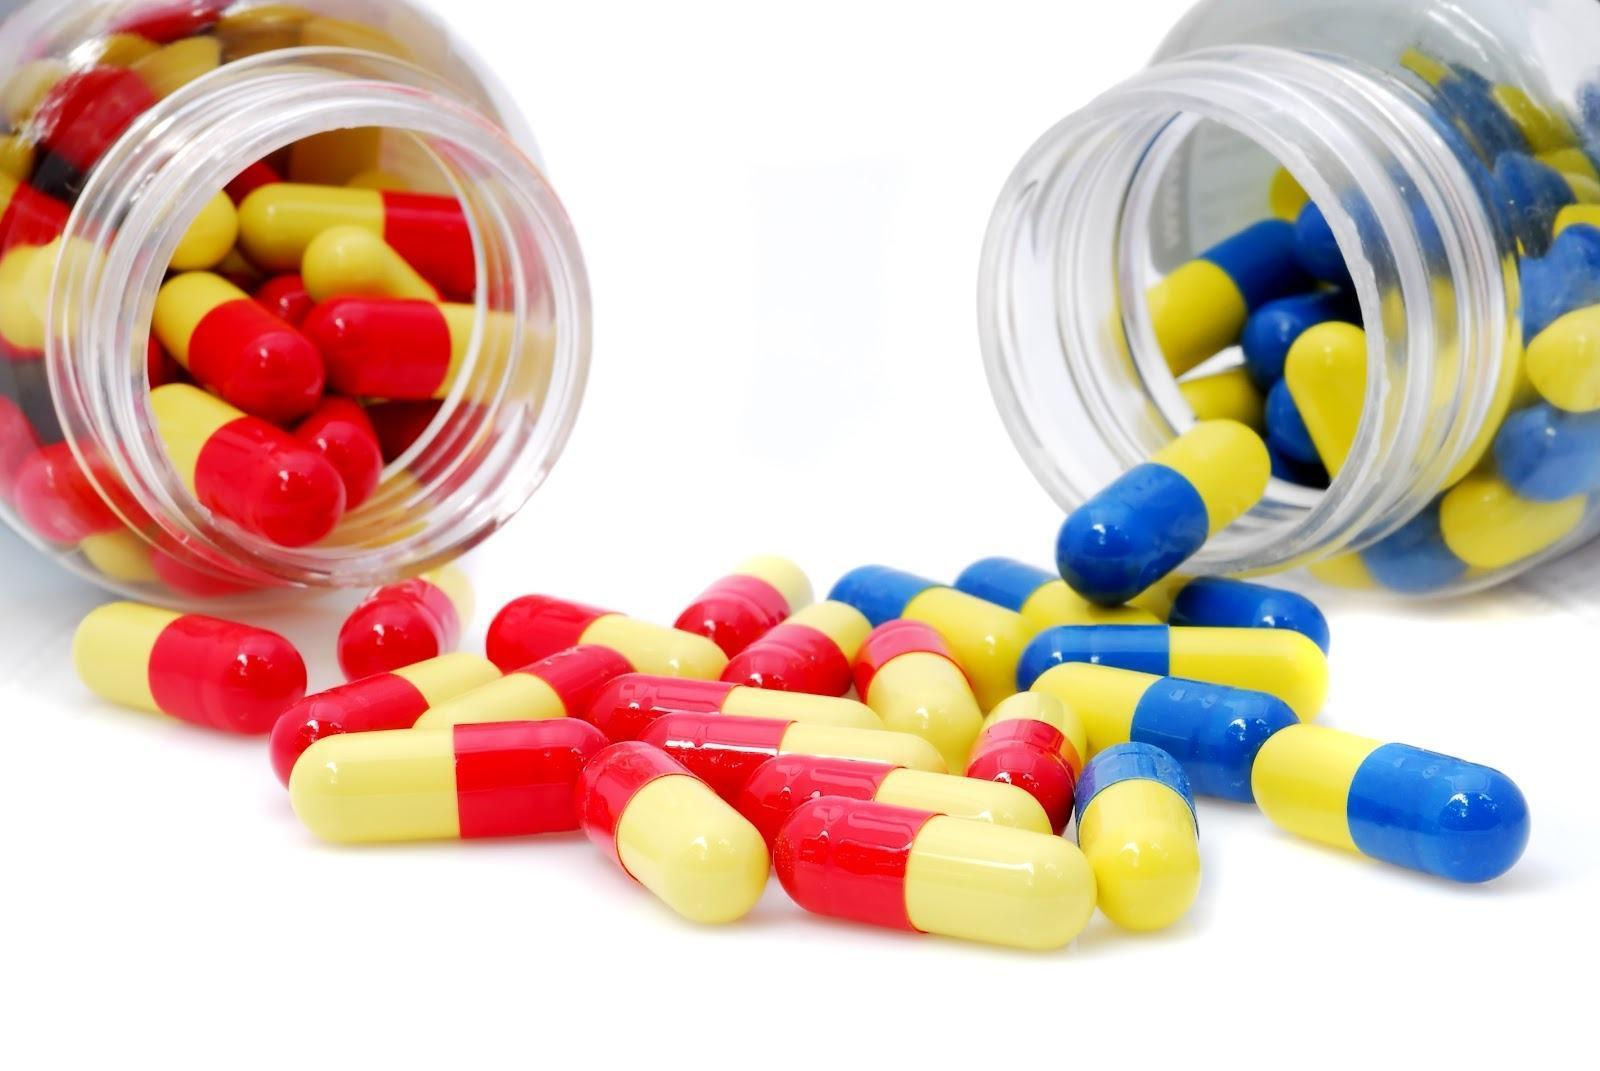 Fosfatidilserina – Propriedades da Fosfatidilserina